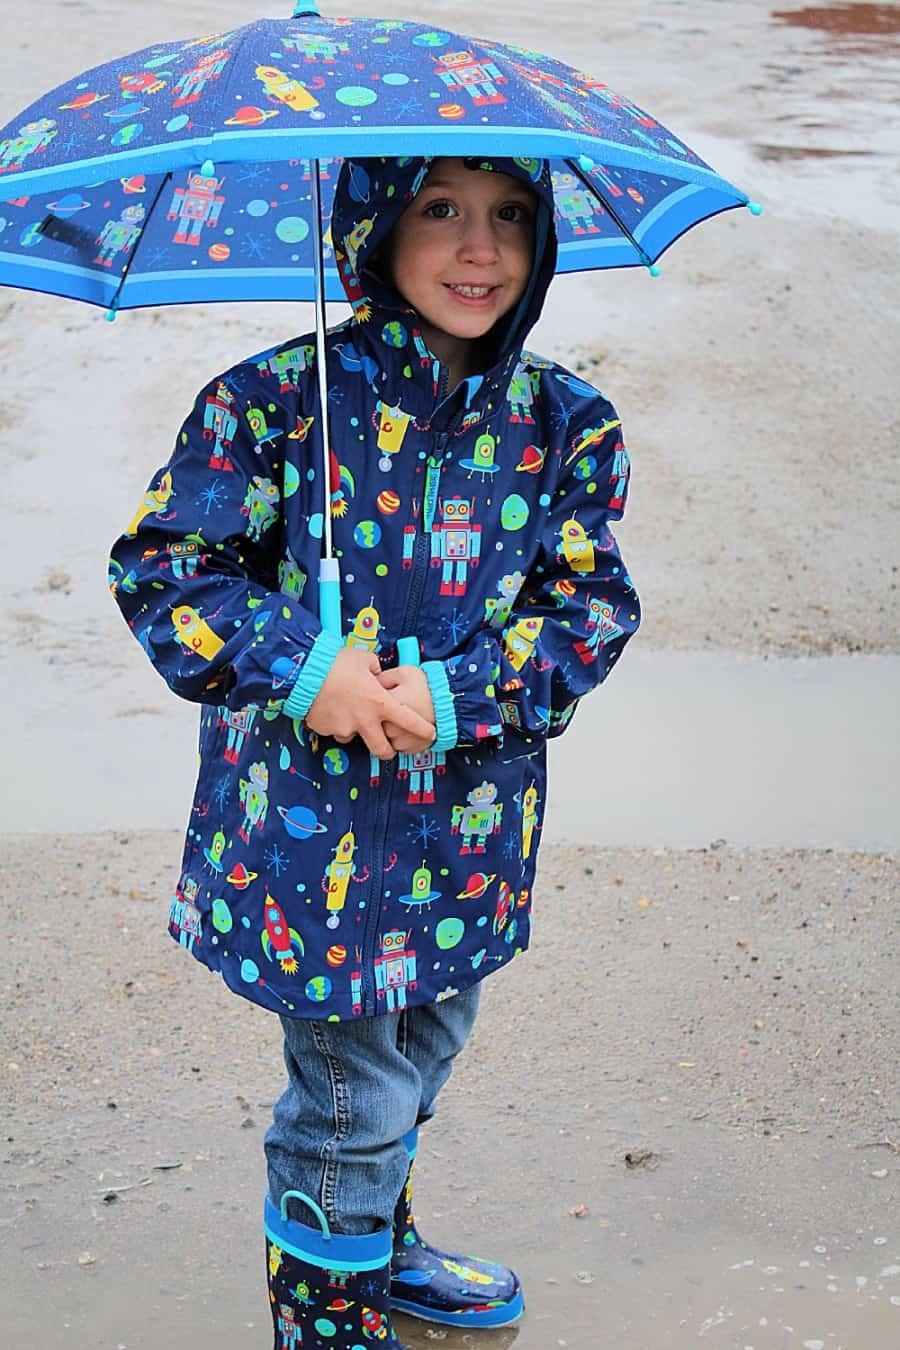 Outdoor Rainy Day Activities For Kids + Stephen Joseph Kids Rain Gear